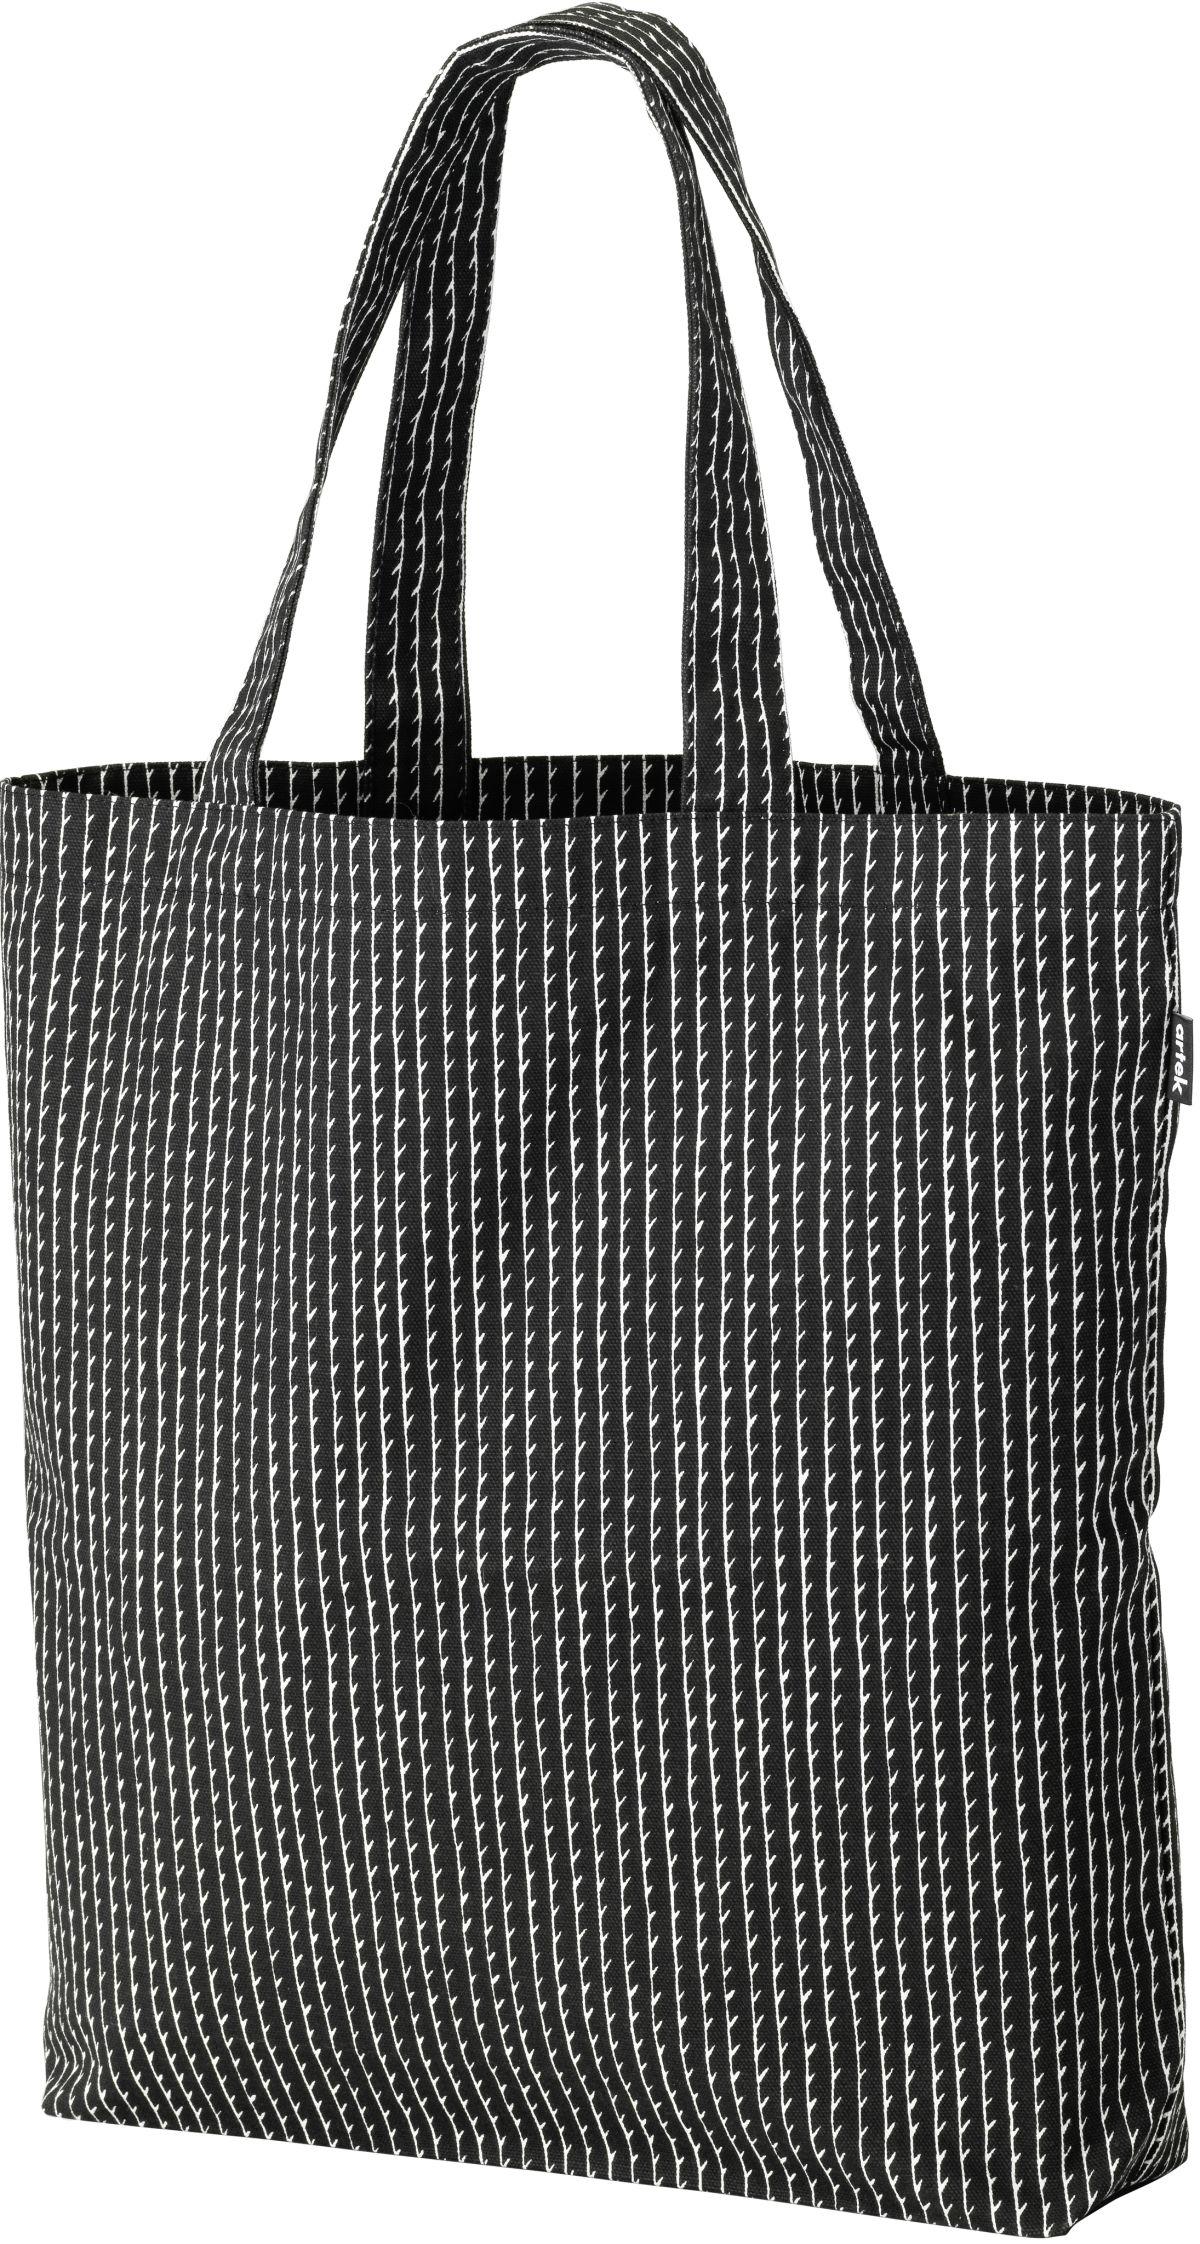 Rivi-Canvas-Bag-Black-_-White_F_Web-2410928